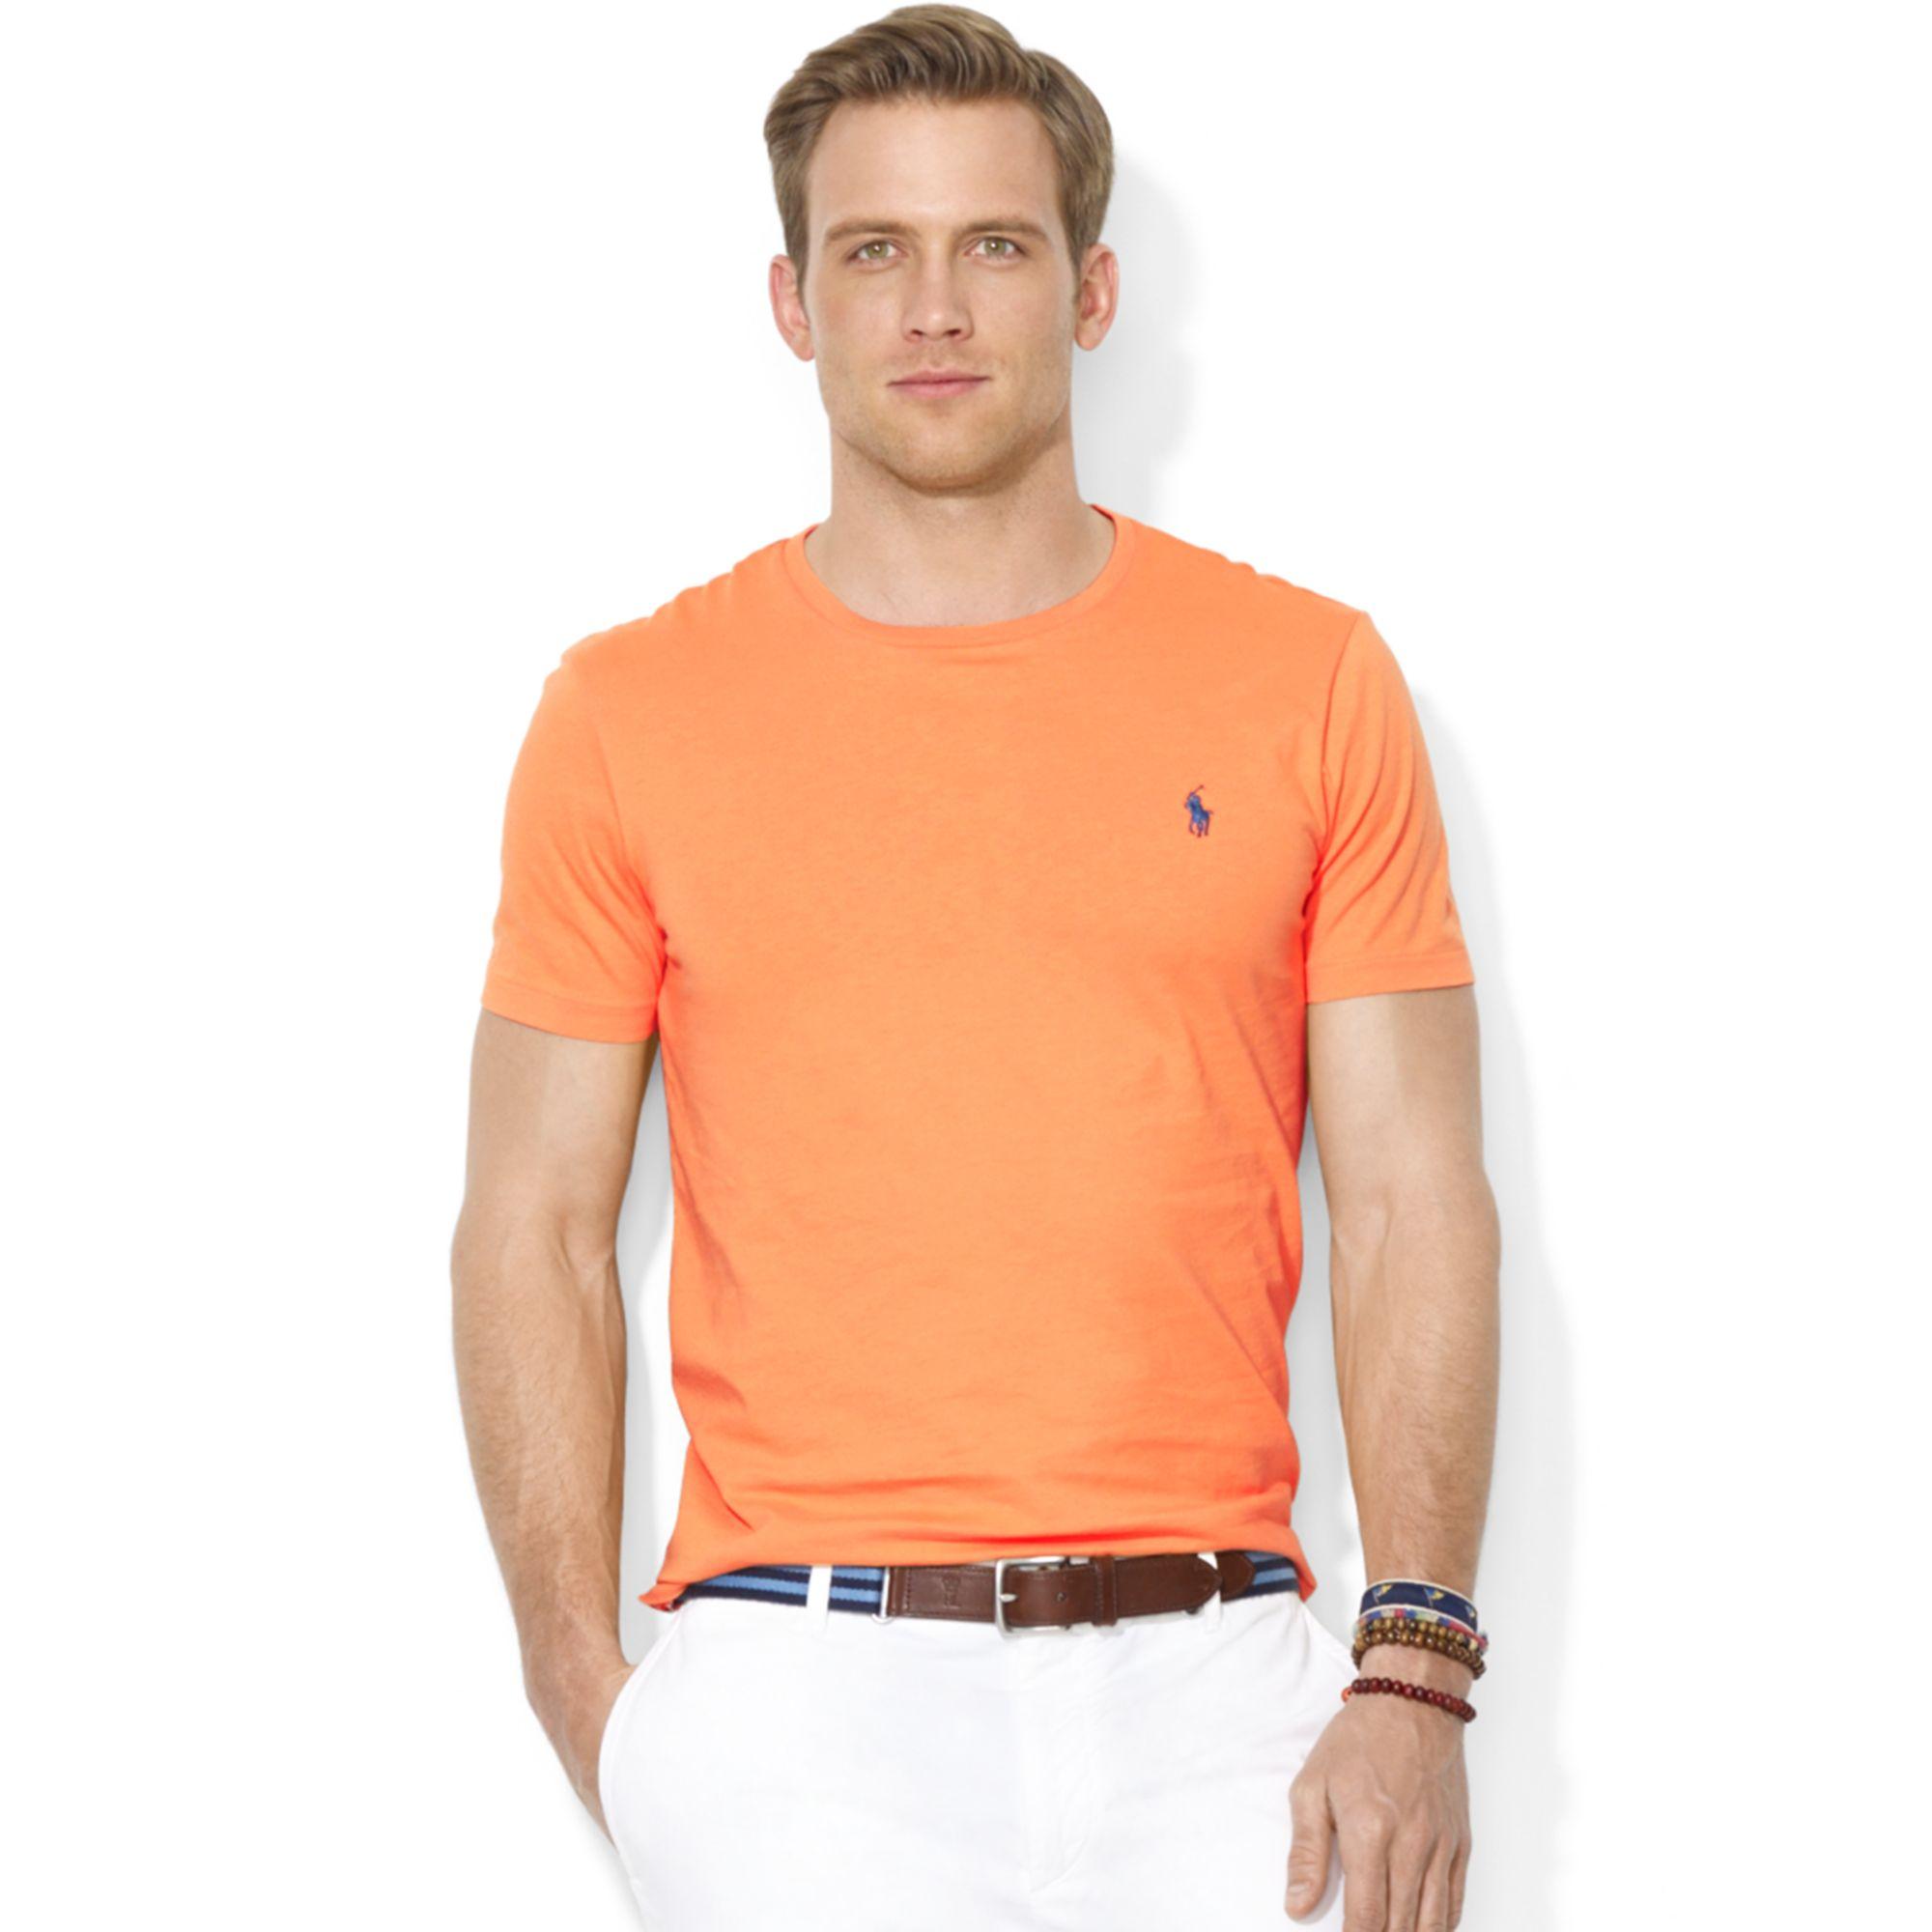 ed4a73e0f962f9 Polo Custom Fit Crew Neck T Shirt - DREAMWORKS